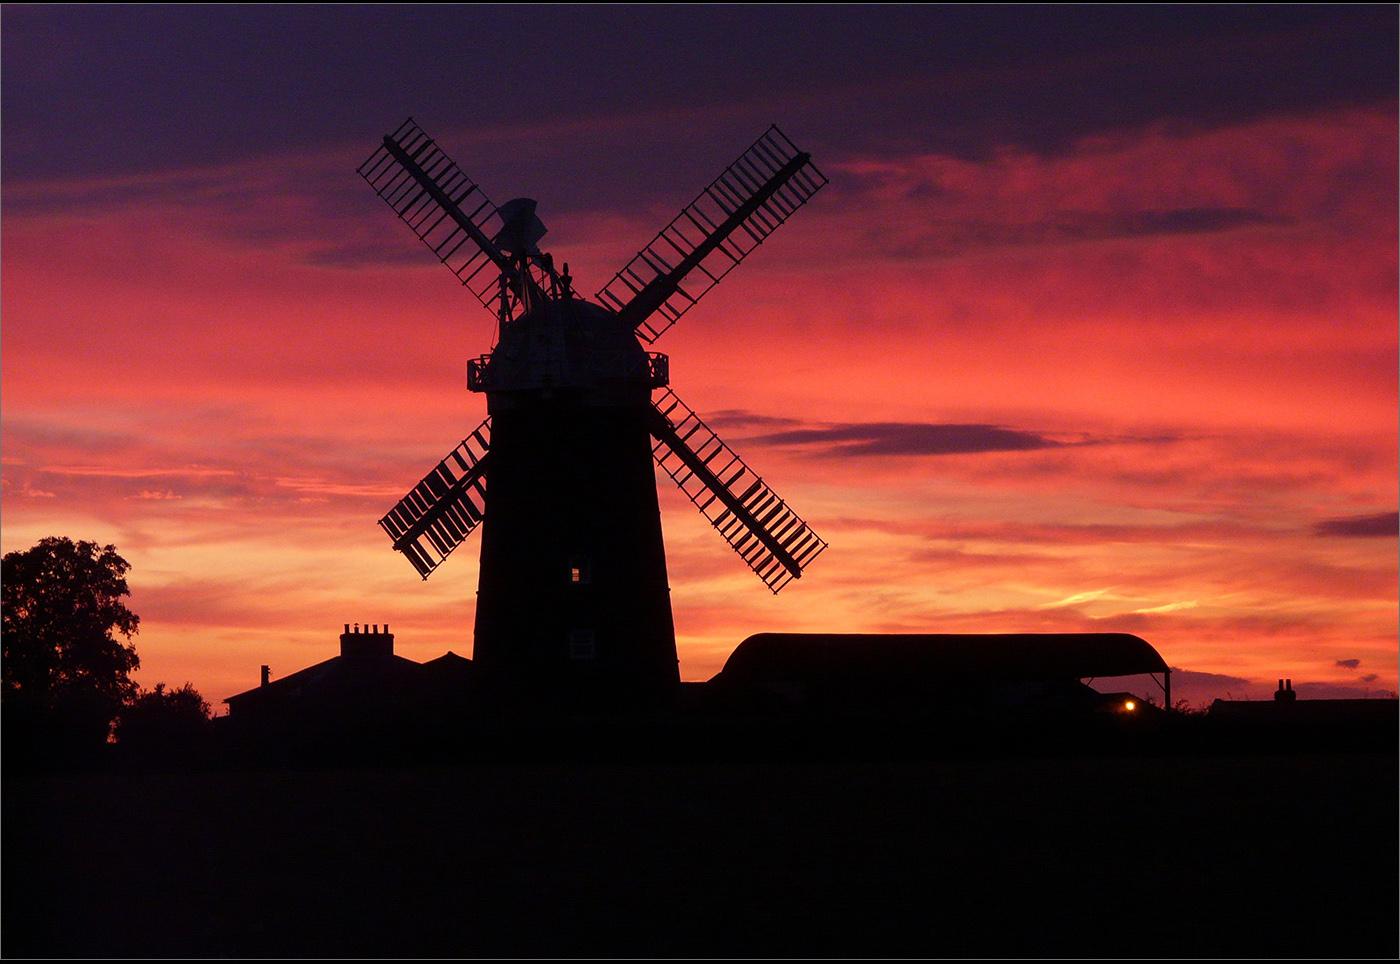 Mill Sails In The Sunset Pakenham